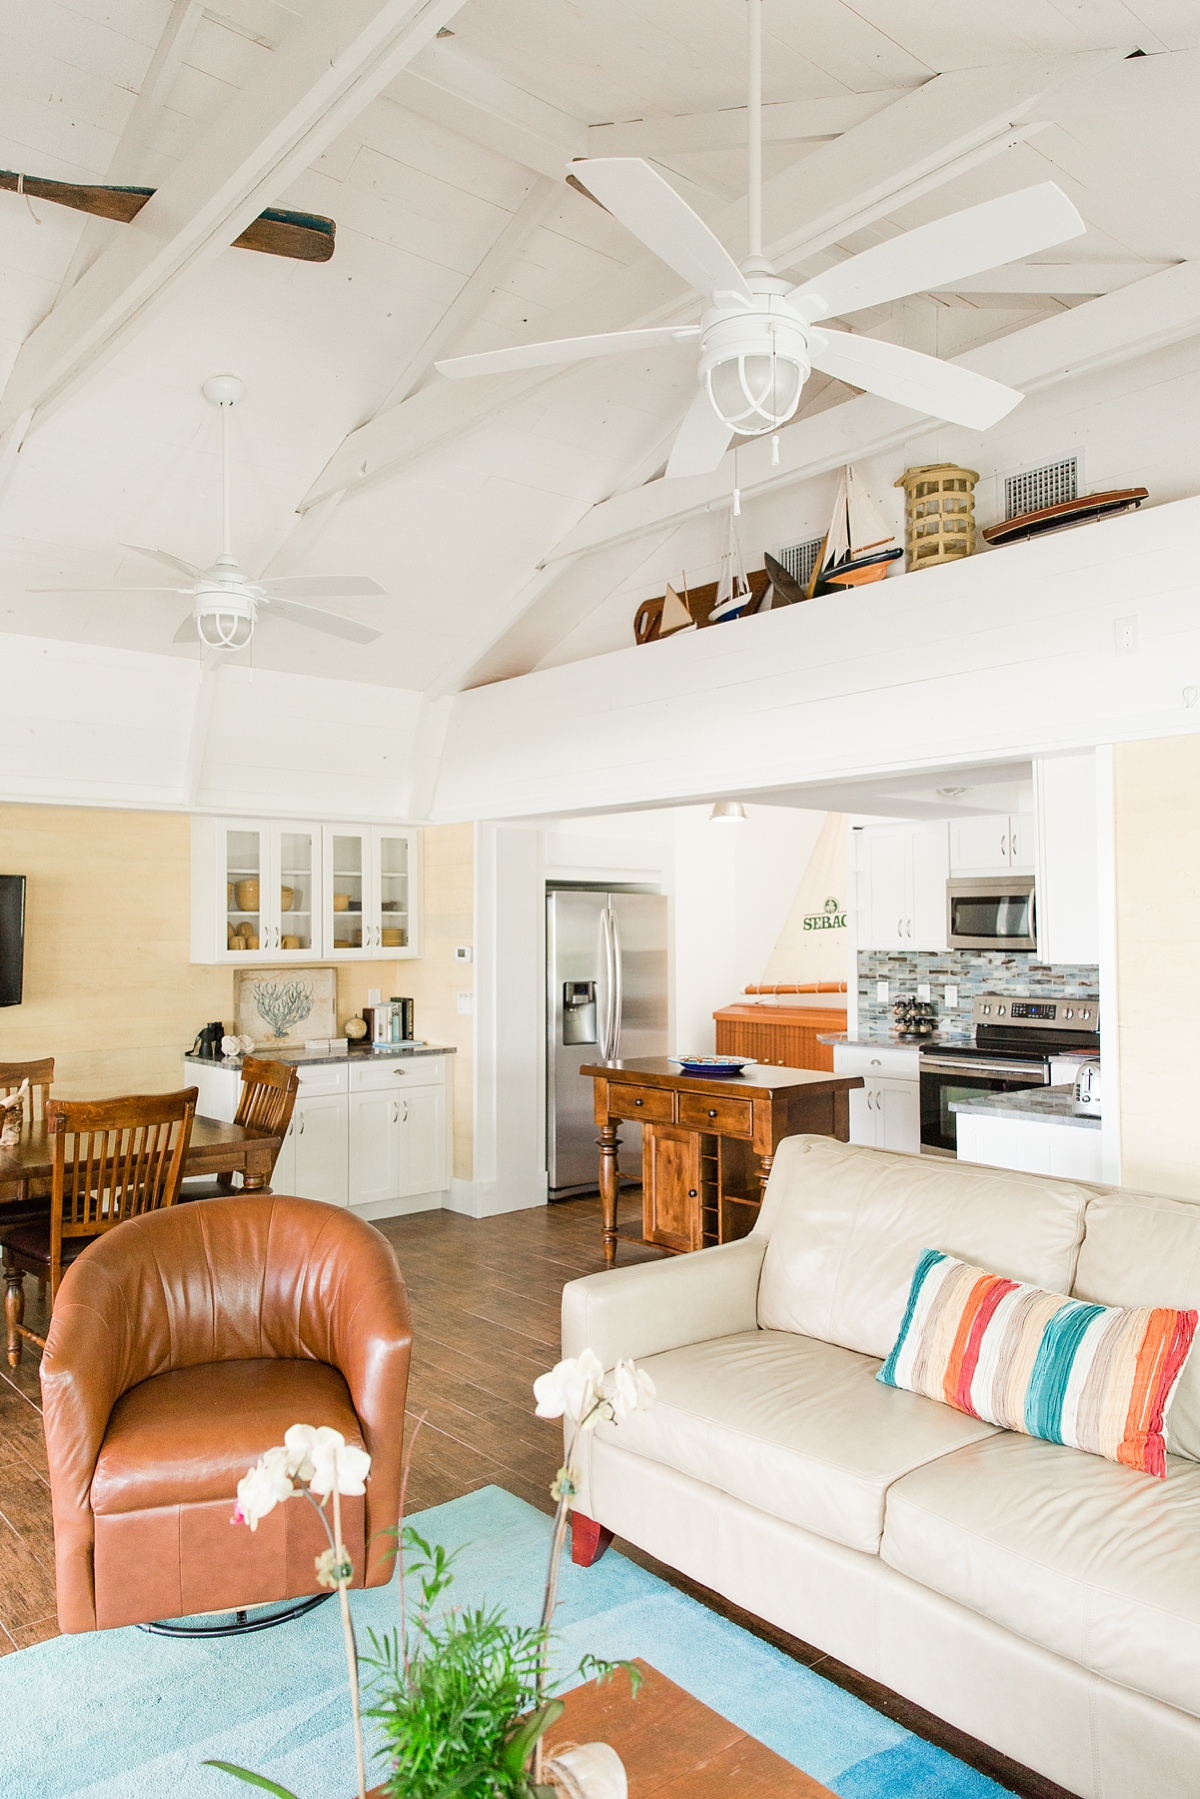 Gasparilla Island Vacation Rentals Florida Beach House_7708